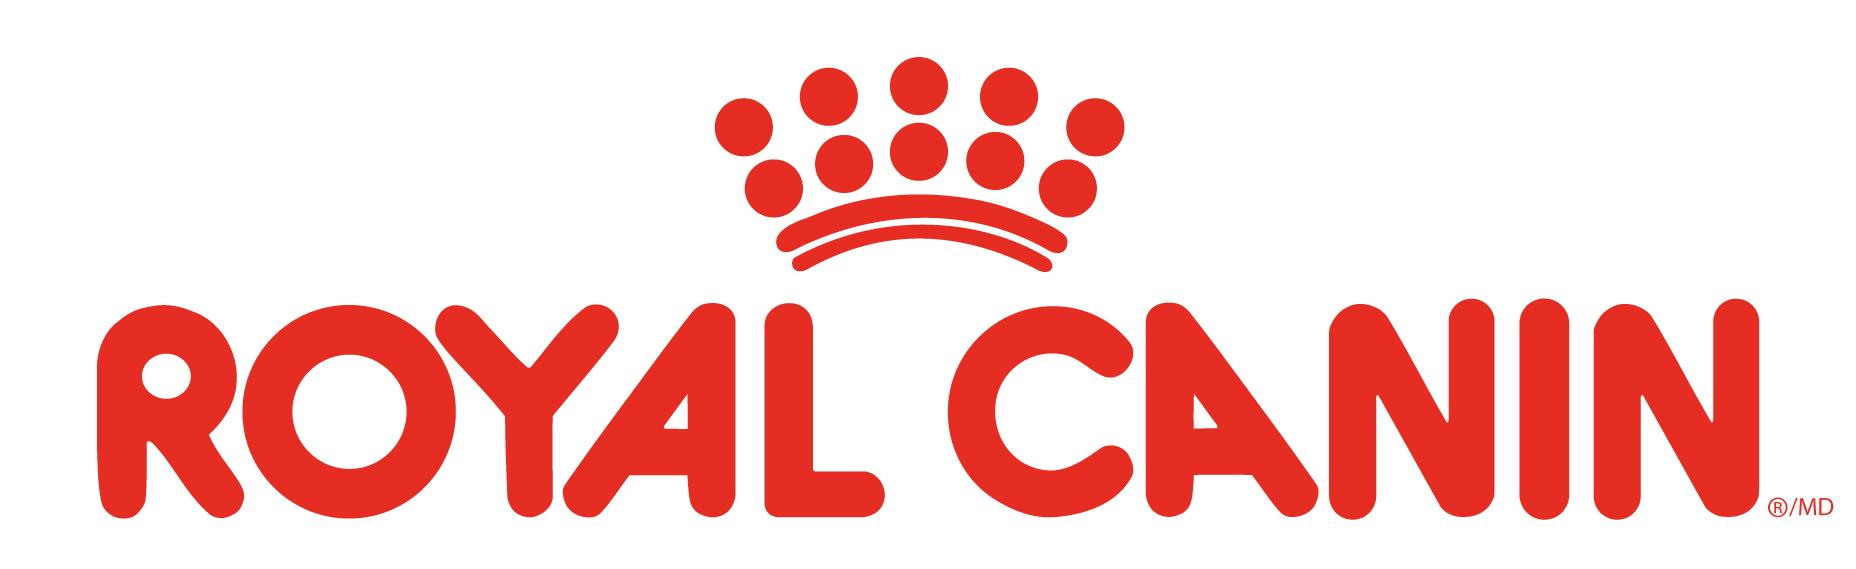 RoyalCanin Logo